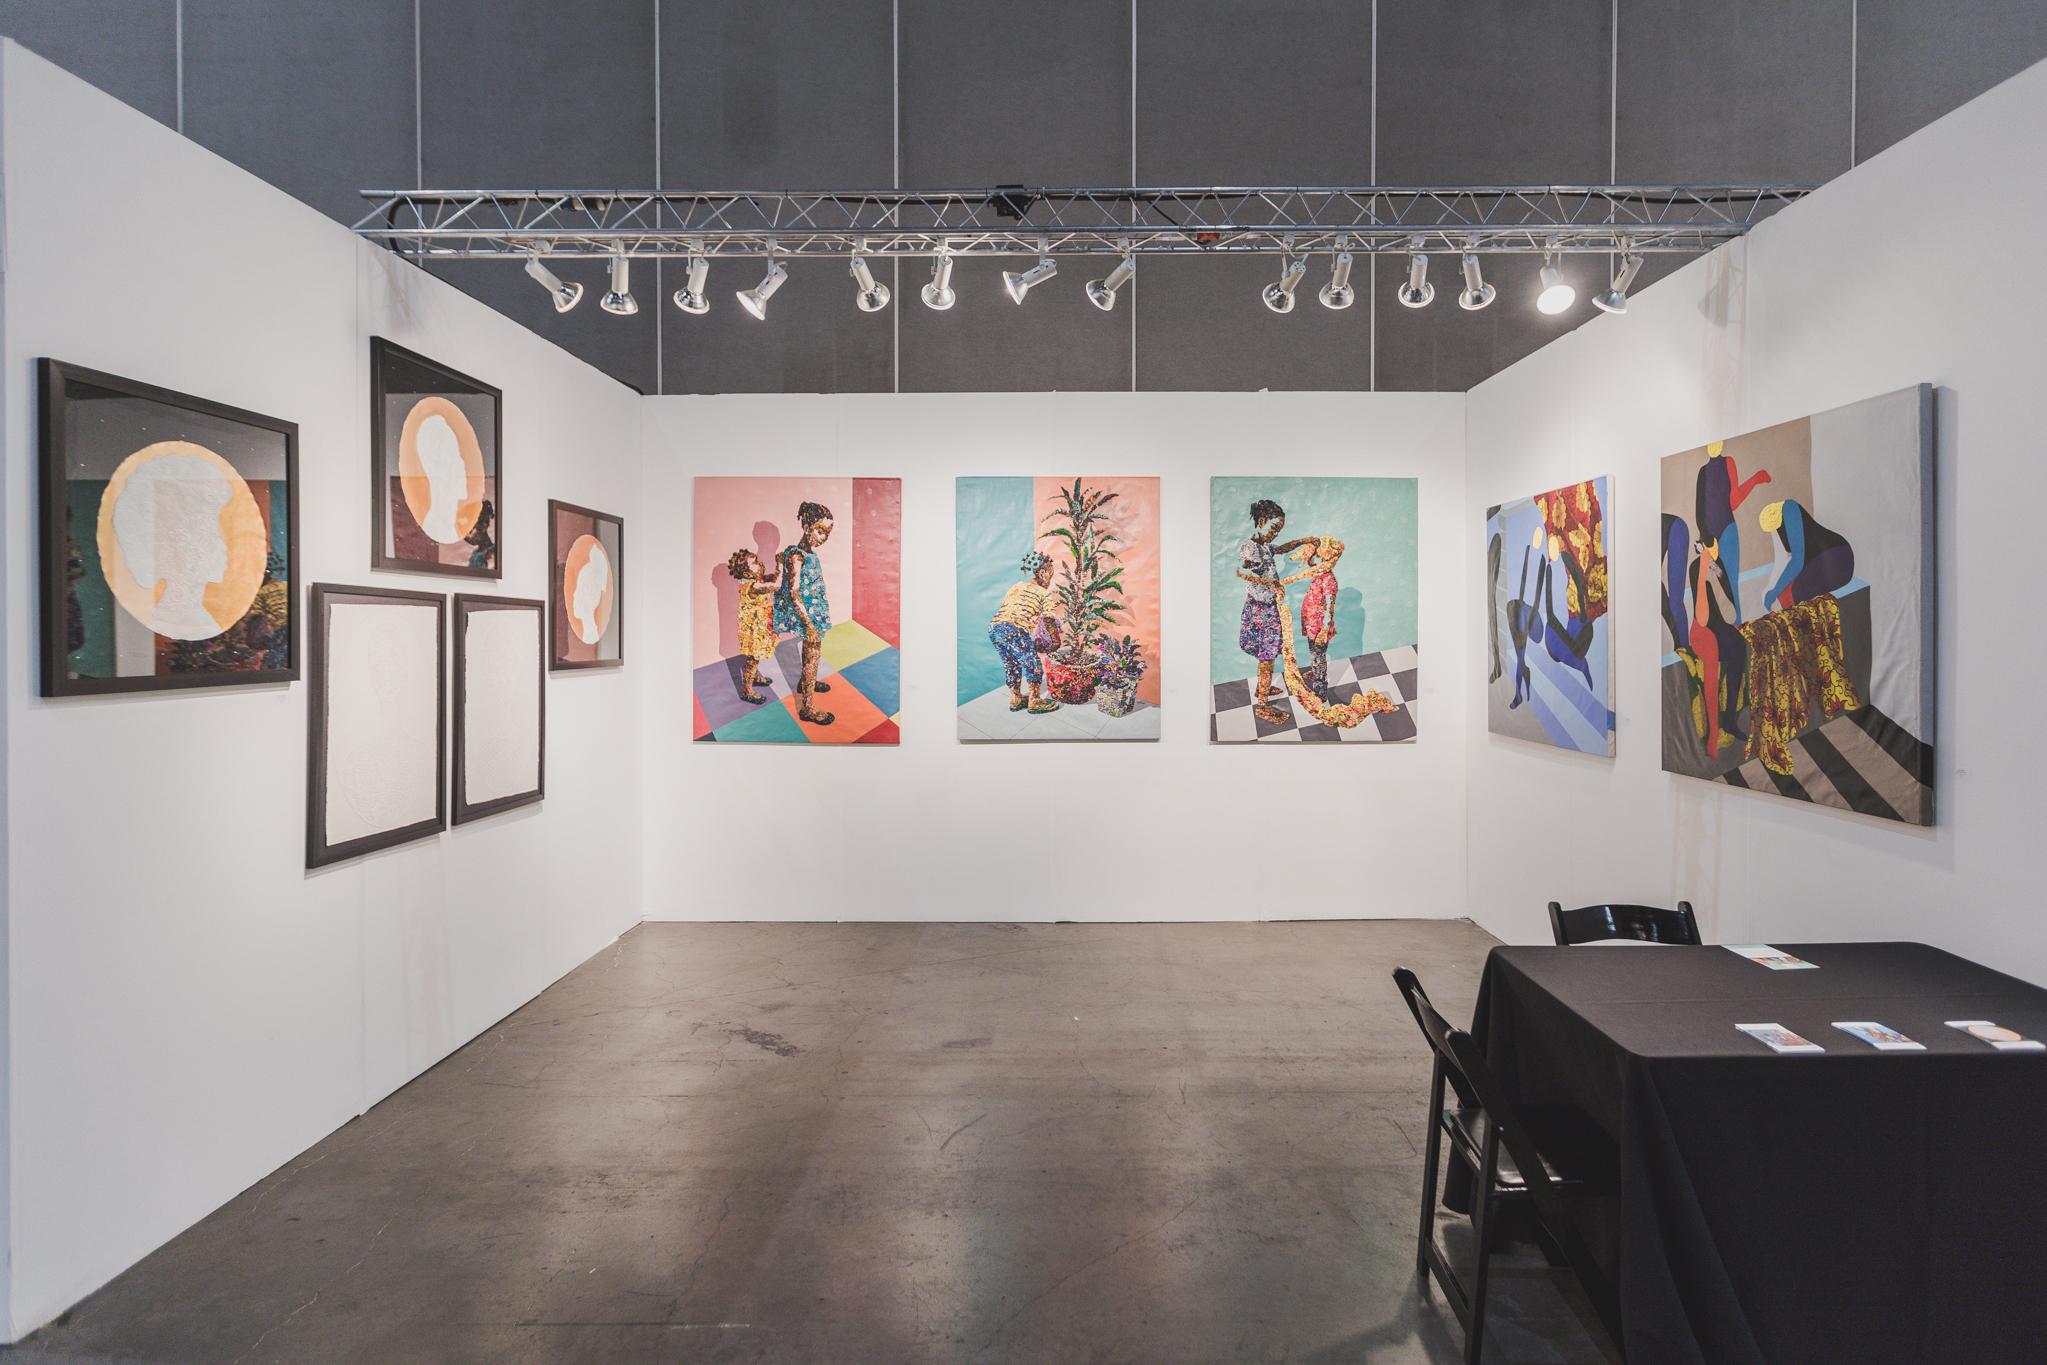 LA Art Show Peaks at 25 Years